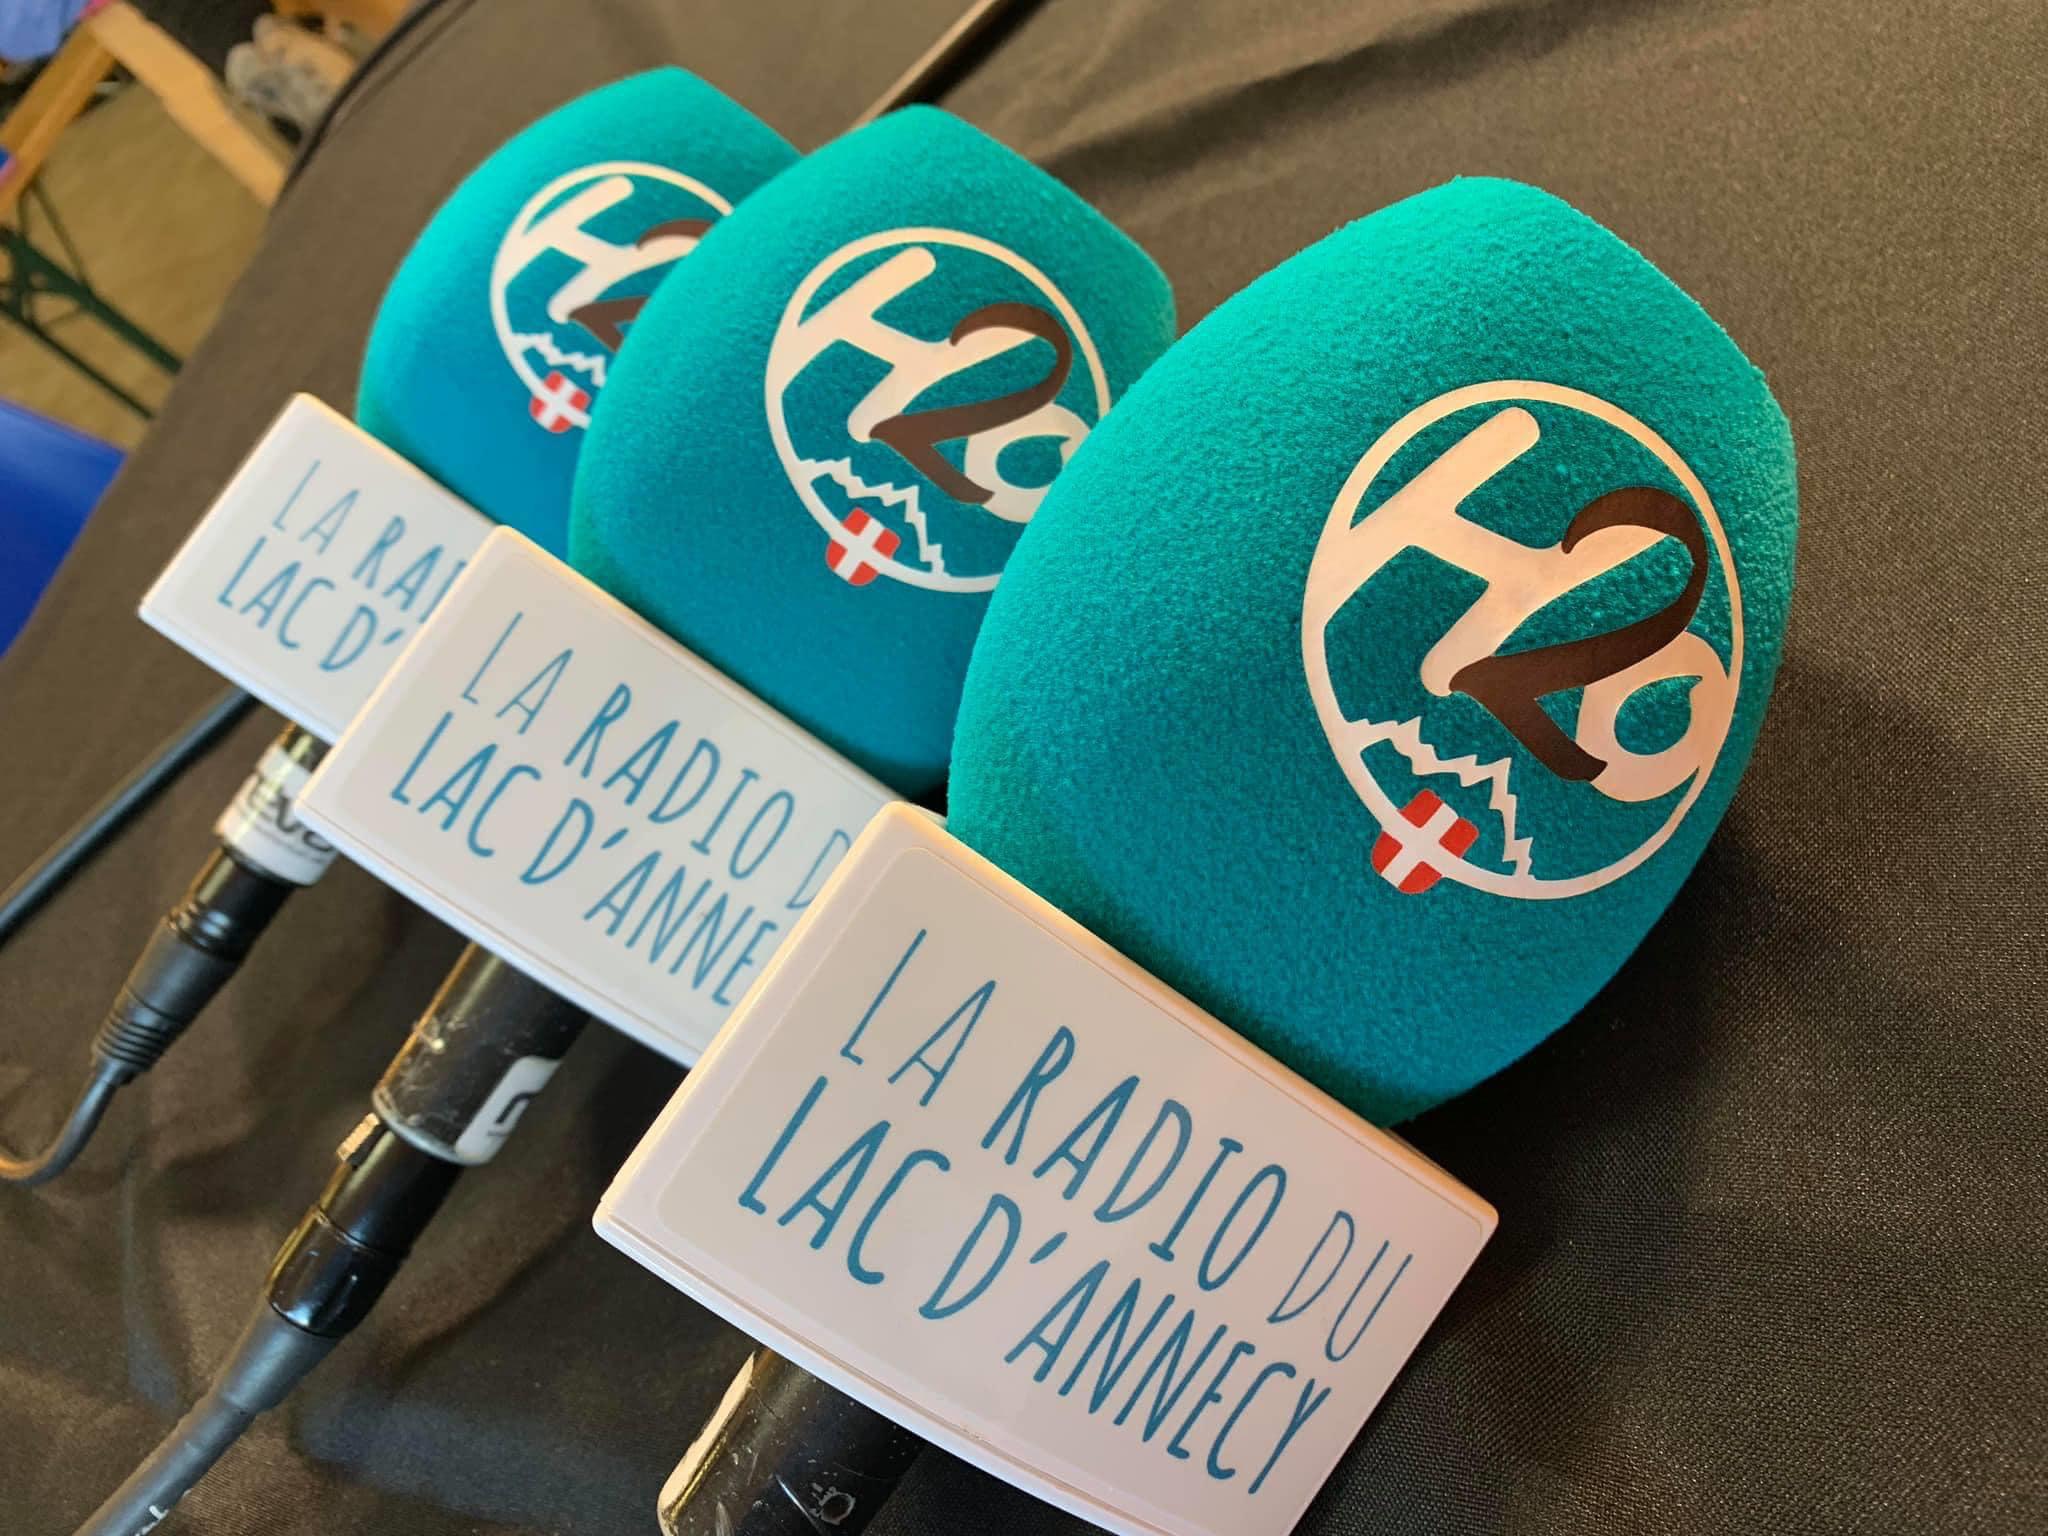 H2O : Mathieu Hutin comparaît devant le tribunal de police